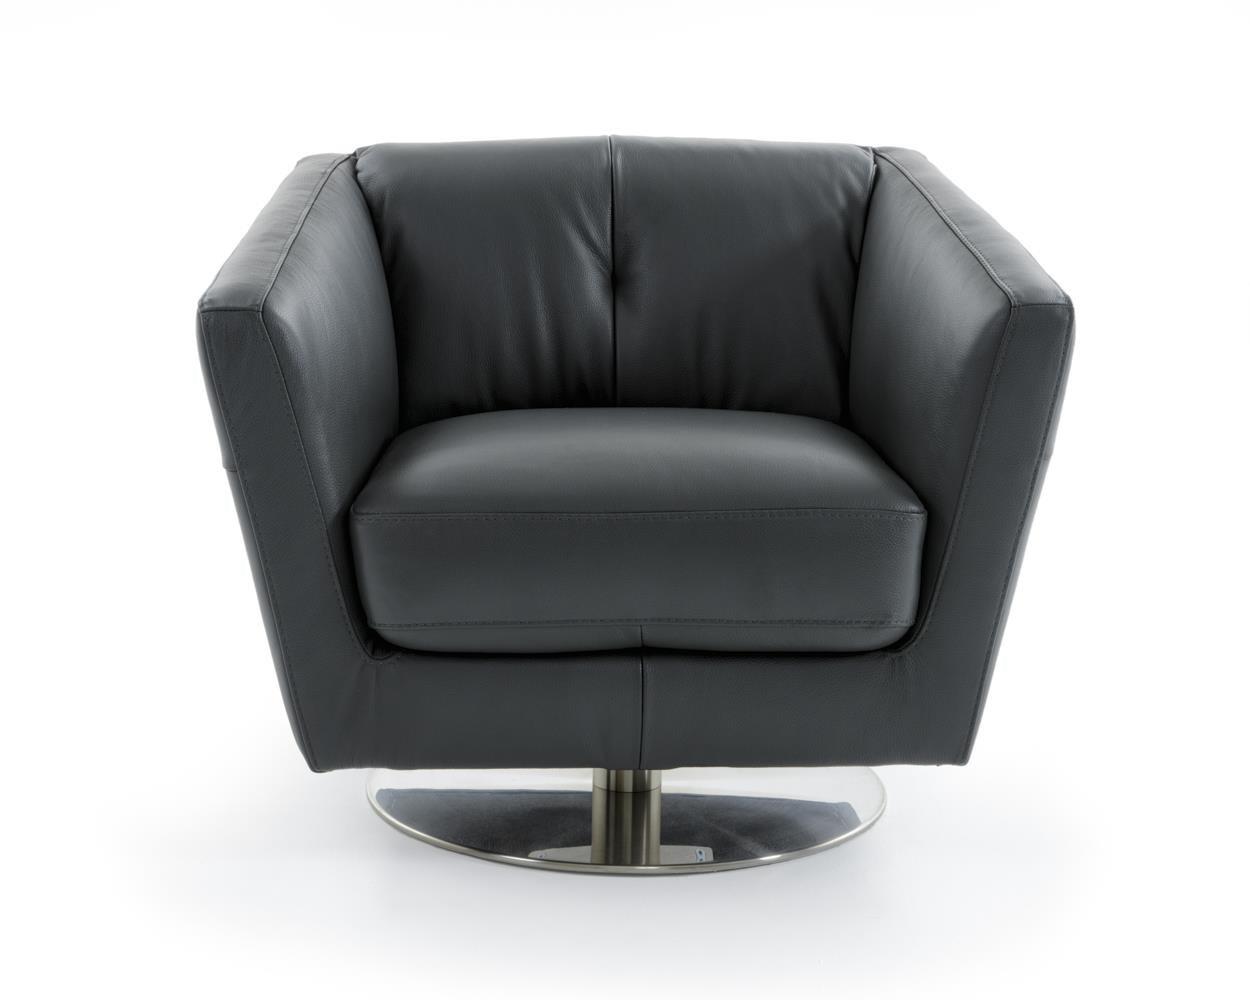 Natuzzi Editions B617 Chair - Item Number: B617-066 10BIsp